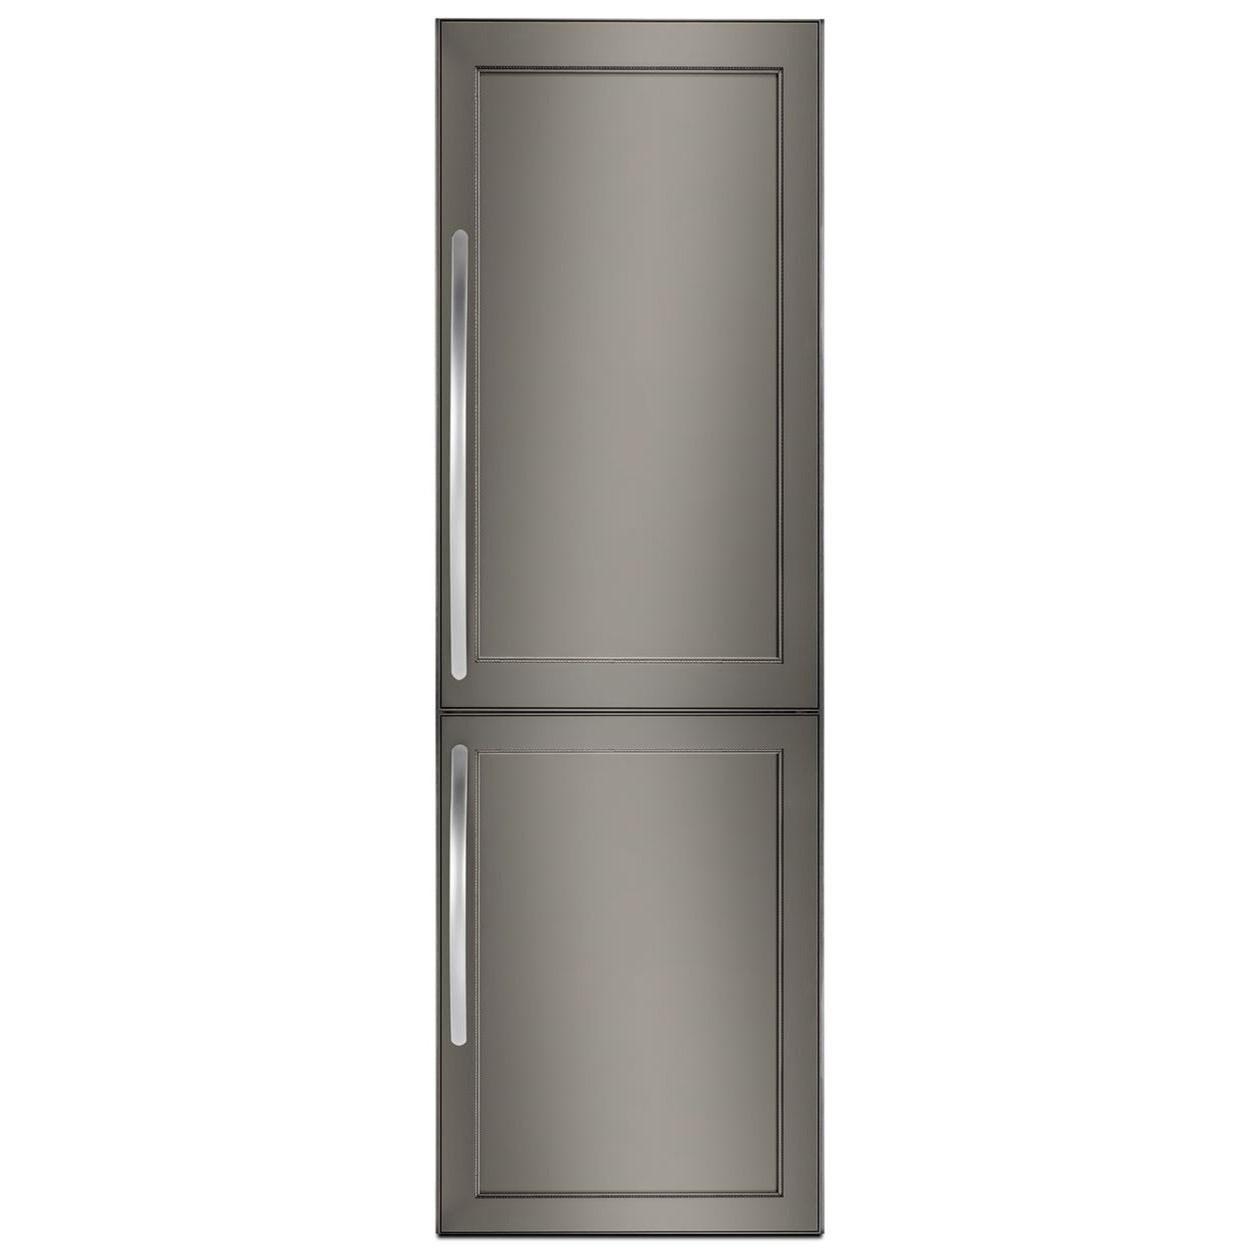 "Bottom Mount Refrigerators 10 Cu.Ft 24"" Panel Ready Bottom Mount Fridge by KitchenAid at Furniture and ApplianceMart"